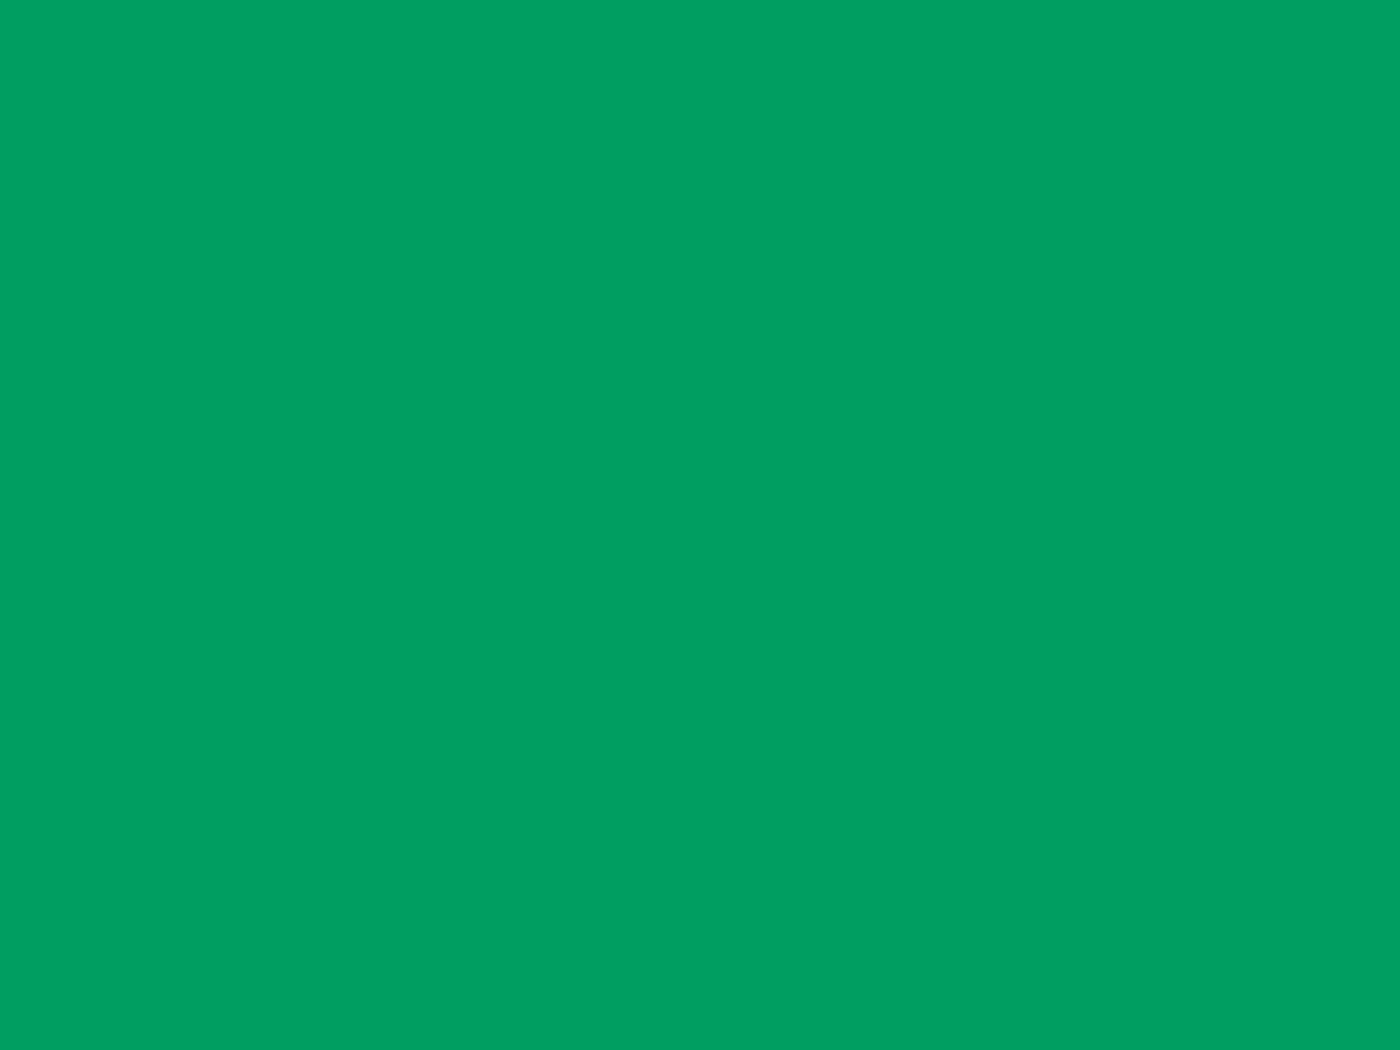 1400x1050 Shamrock Green Solid Color Background